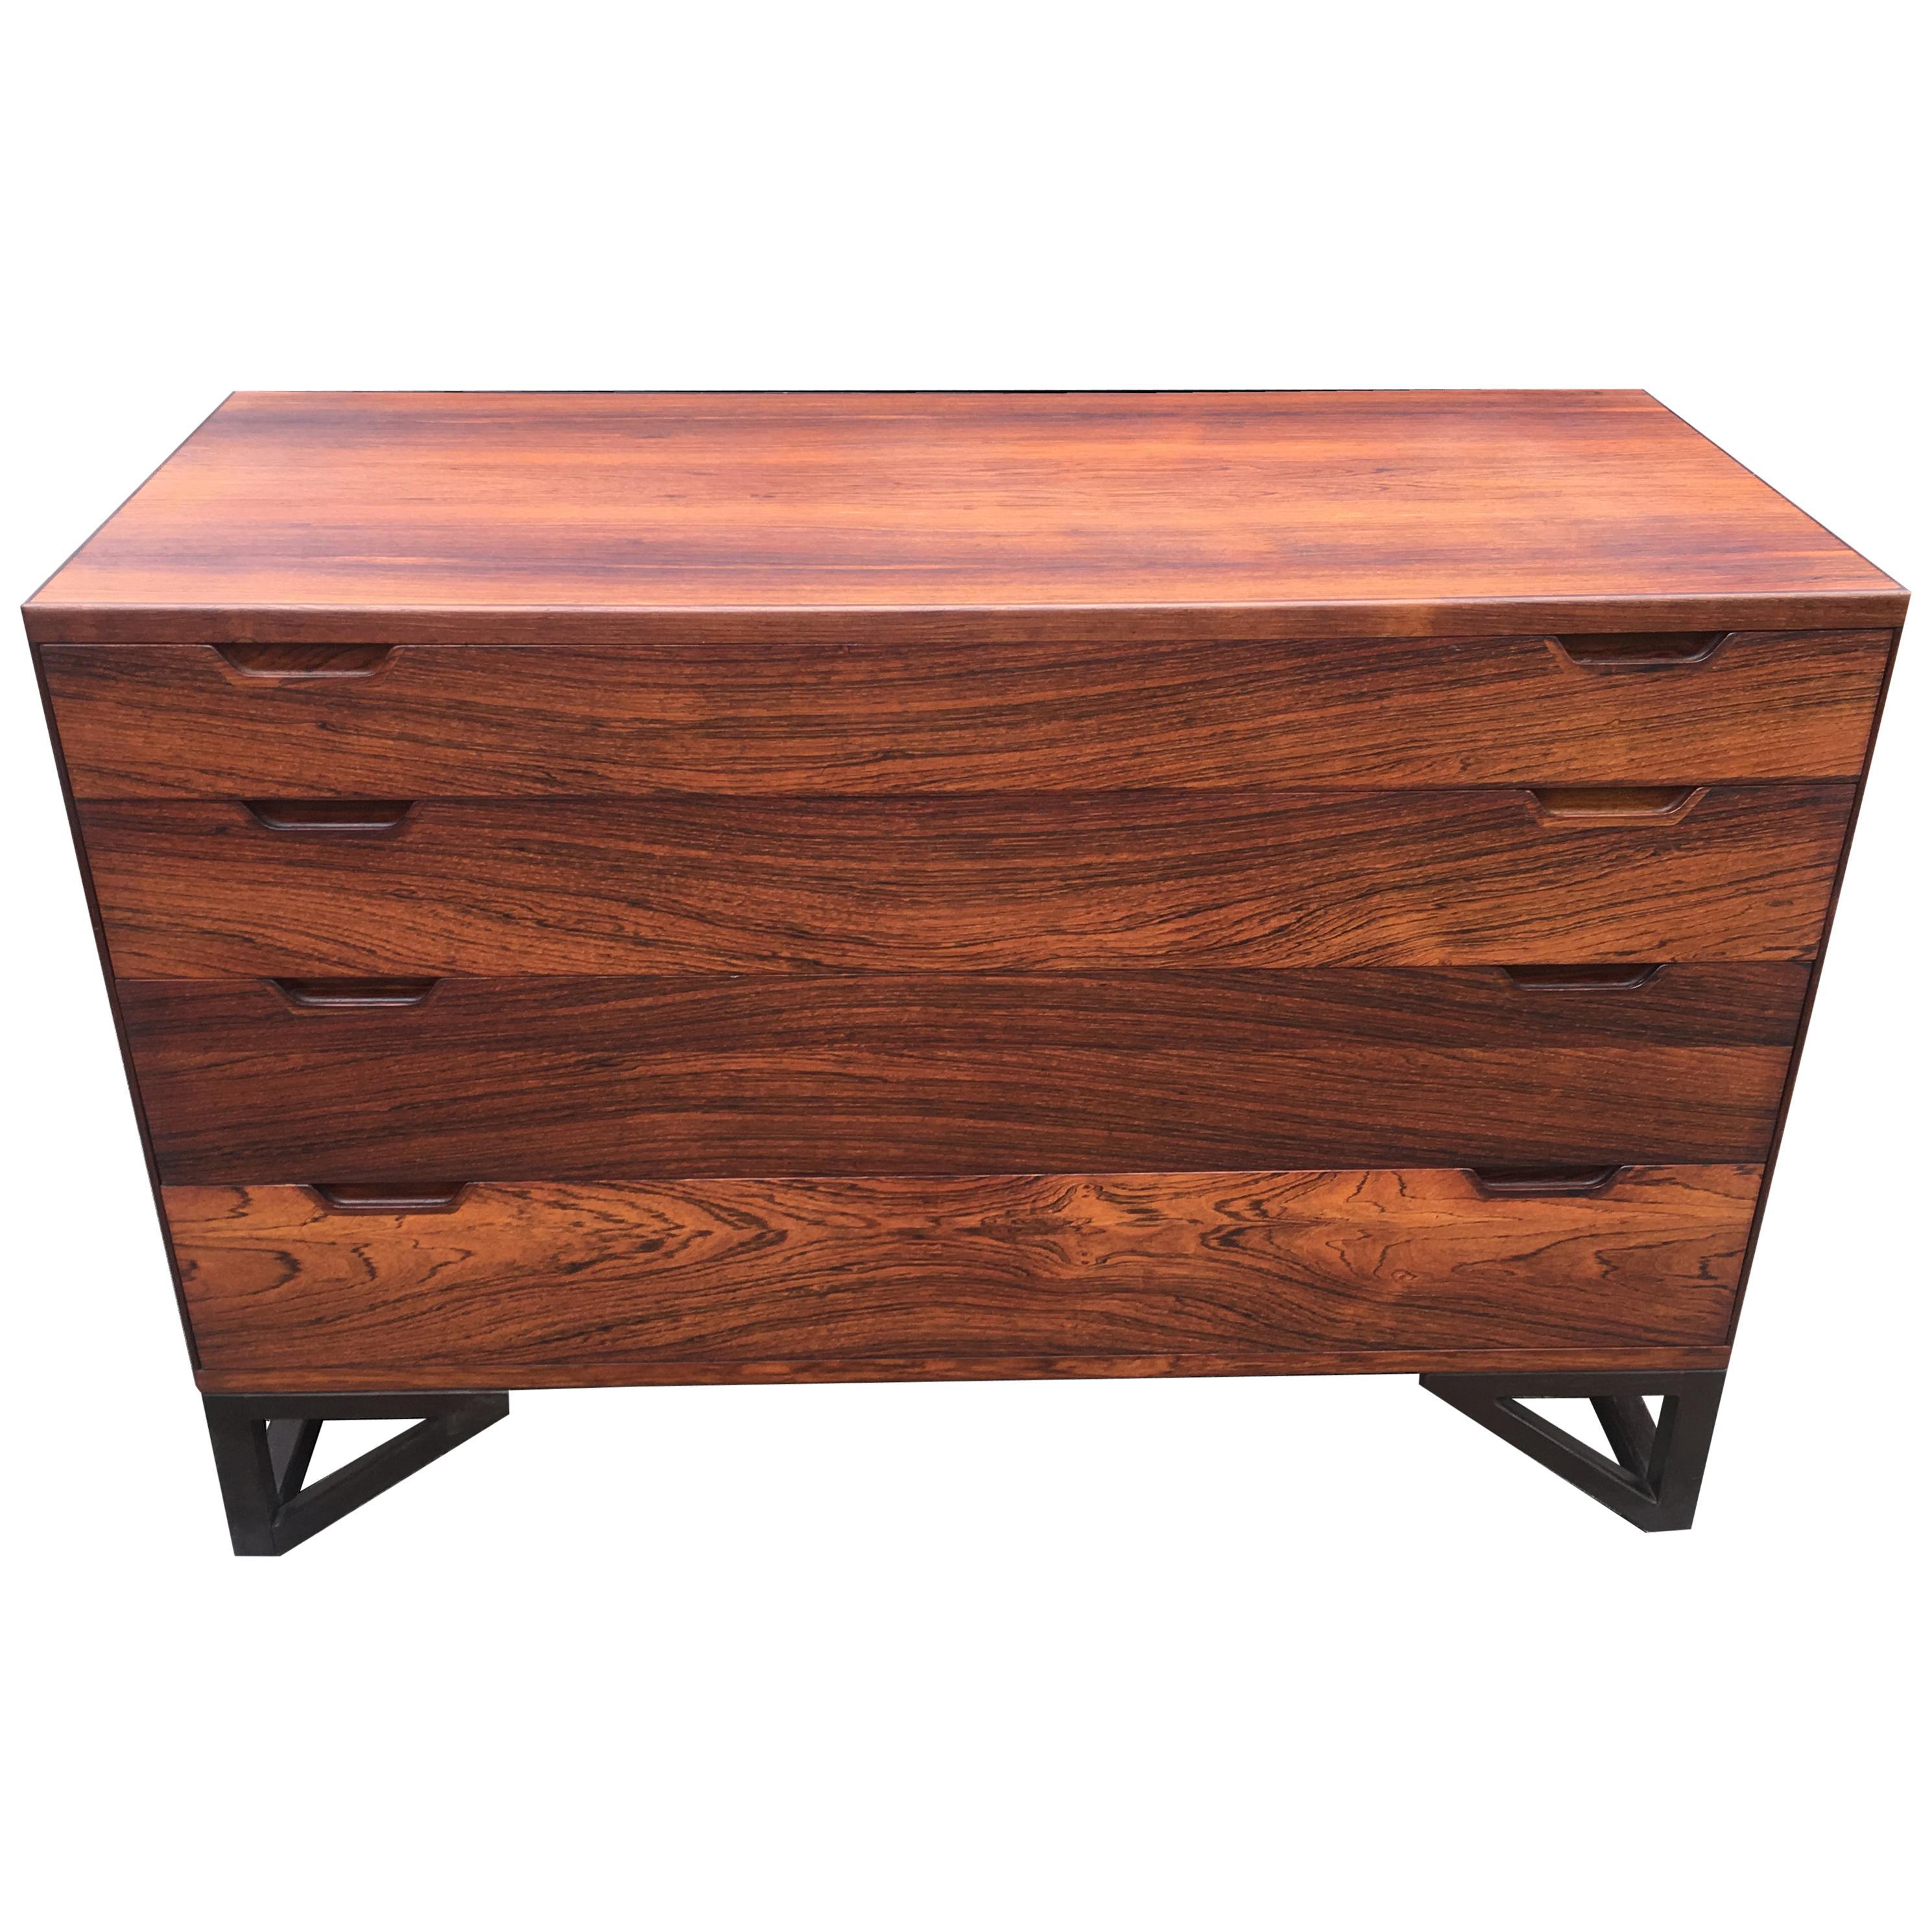 Danish Hardwood Chest of Drawers by Svend Langkilde for Langkilde Mobler